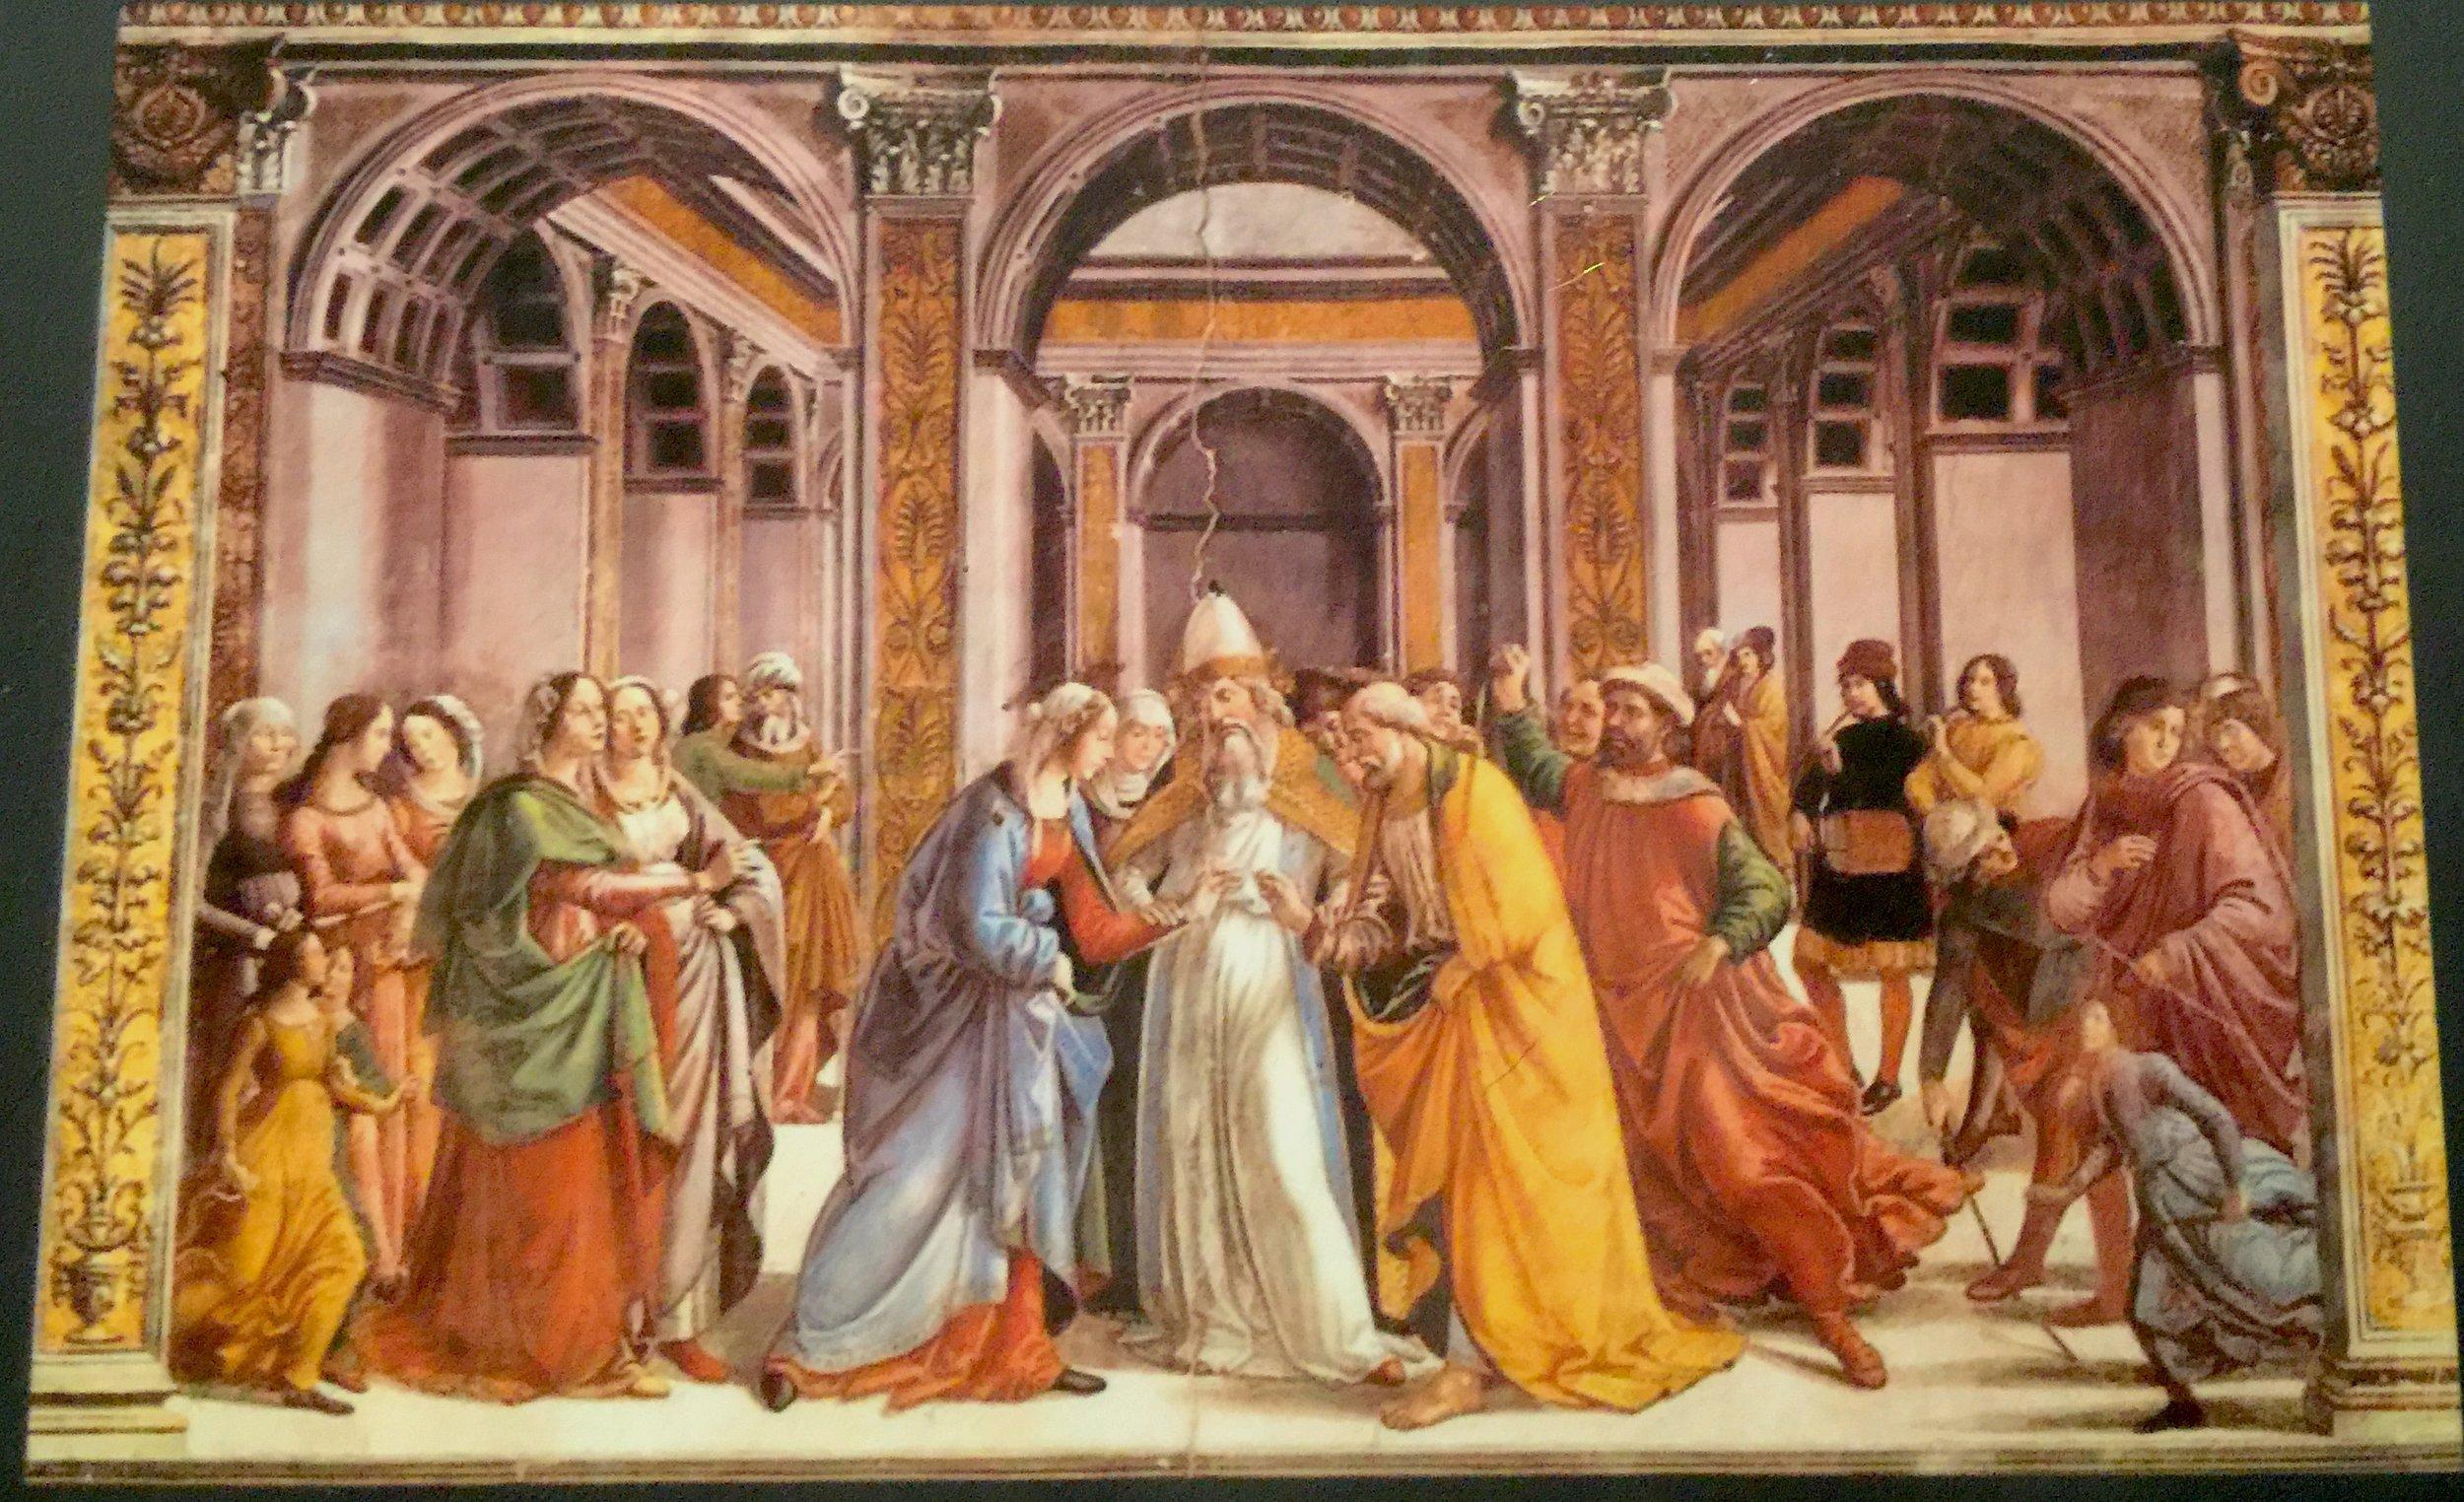 Domenico Ghirlandaio, Marriage of the Virgin, ca. 1485-90. Fresco.壁畫《聖母的婚禮》